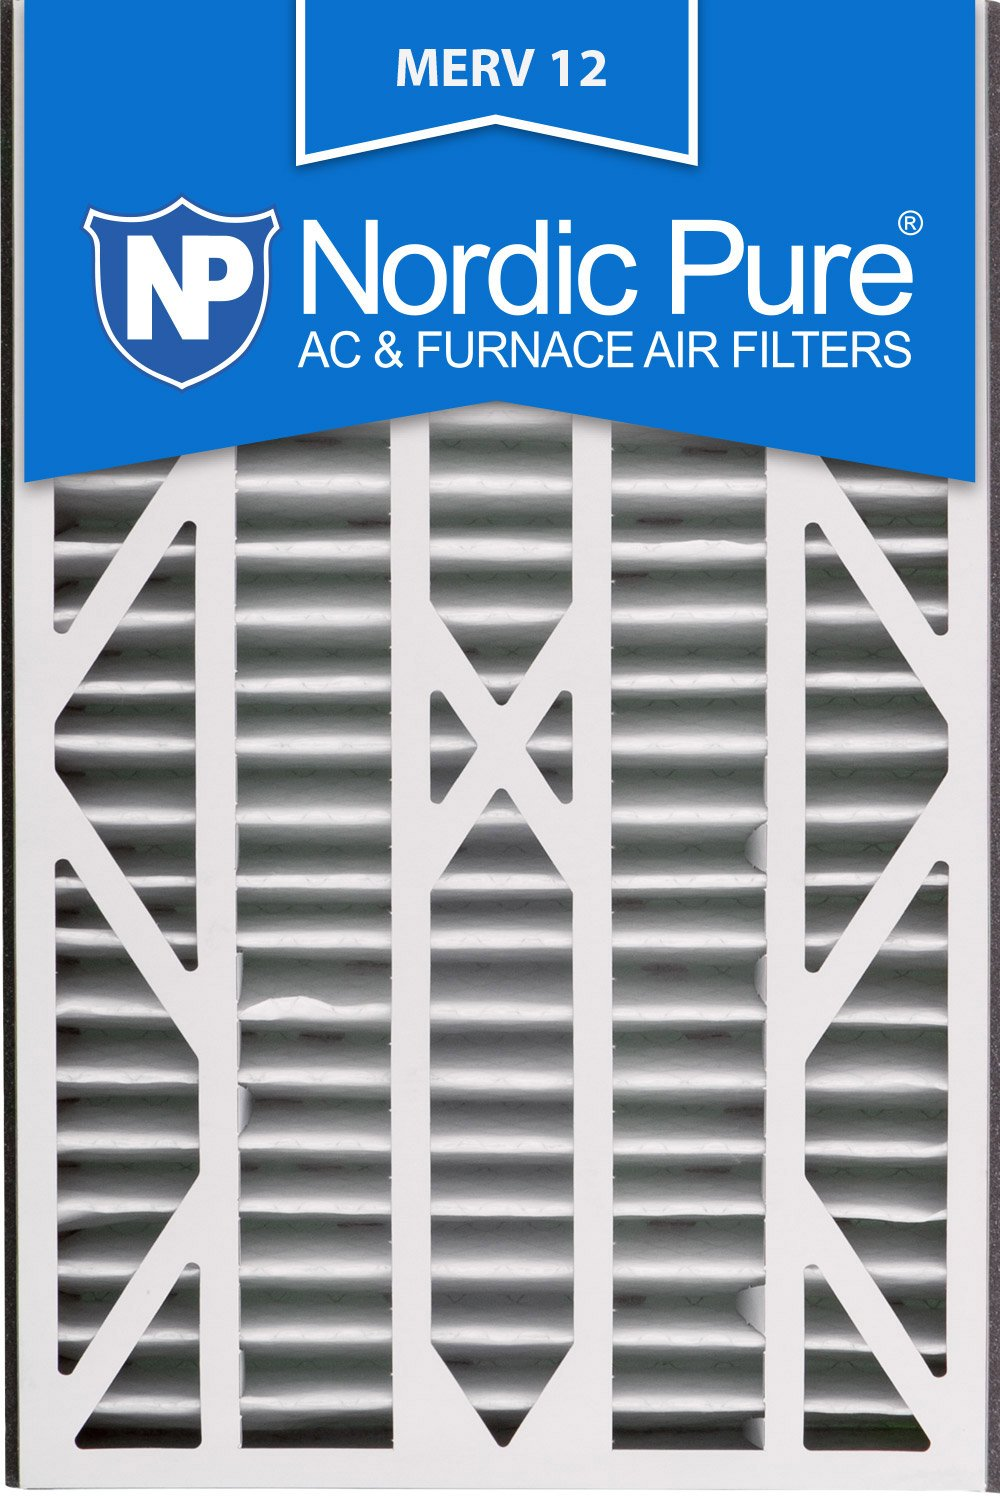 Nordic Pure 16x25x3ABM12-7 Merv 12 交流电炉过滤器,7 件